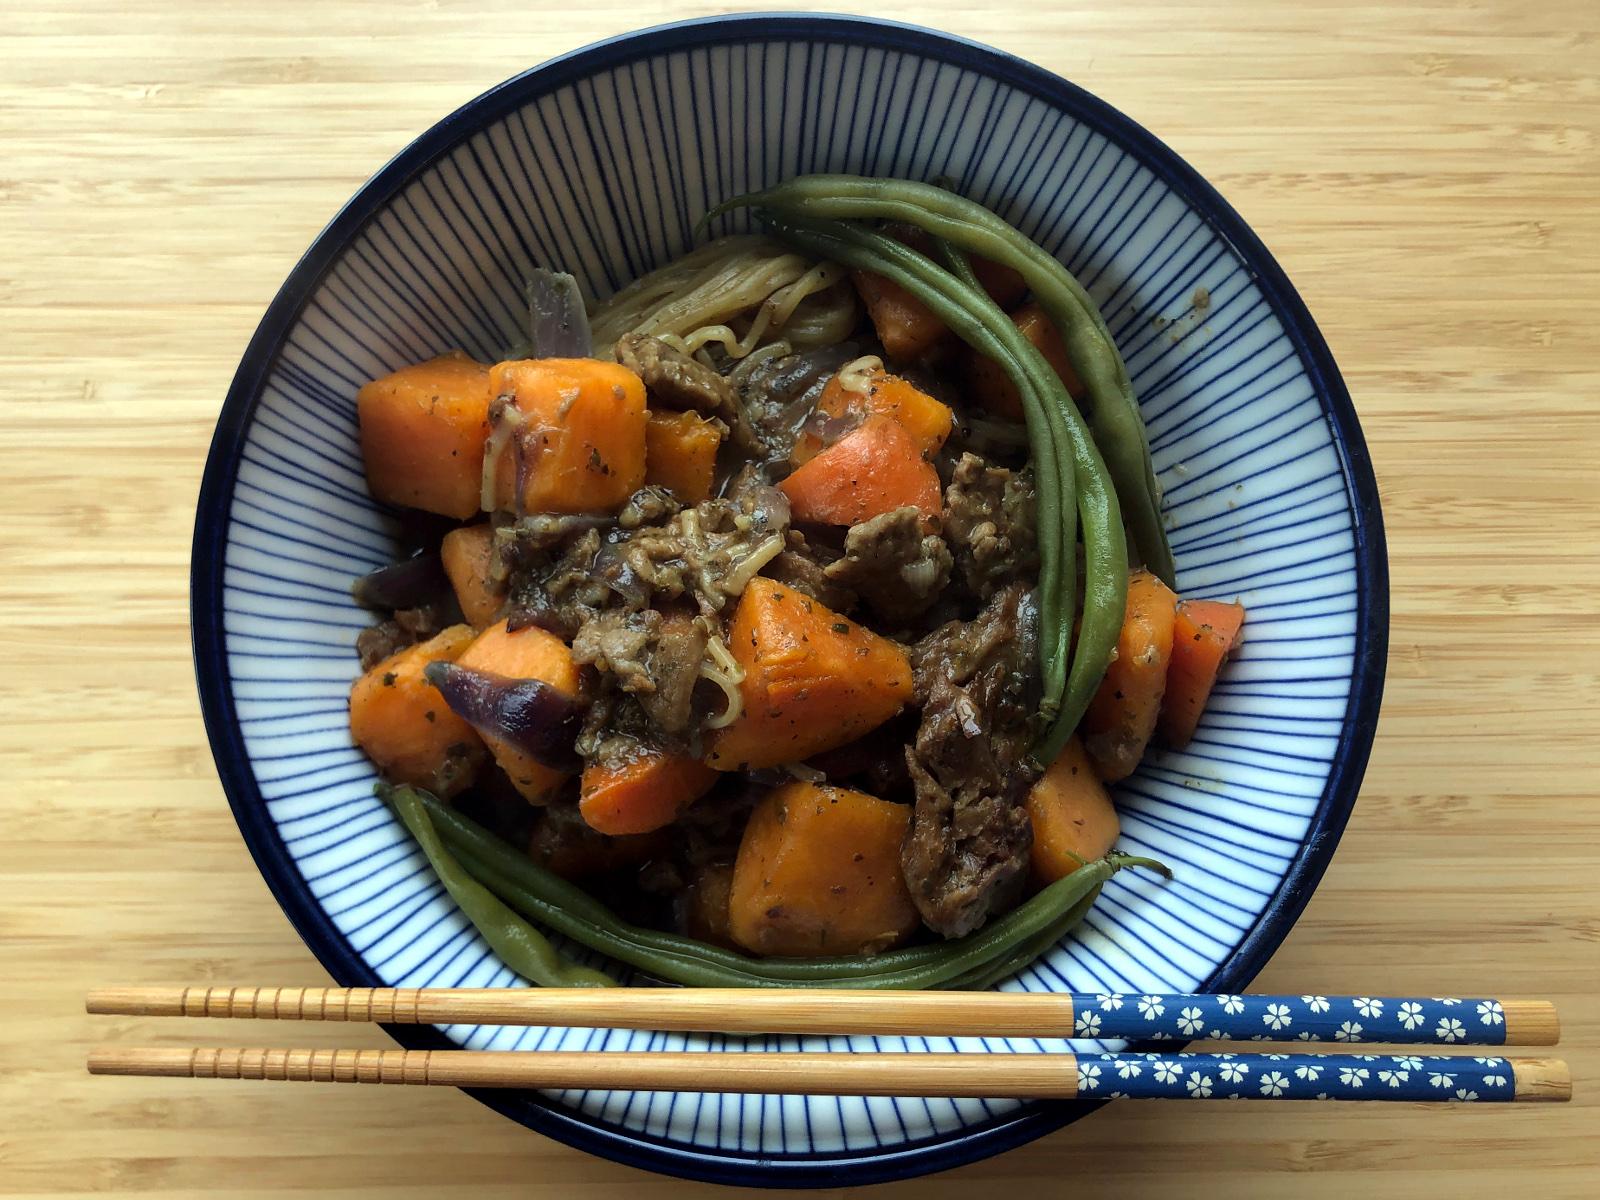 apońska kuchnia wegańska: wegańska nikujaga (biigan nikujaga)